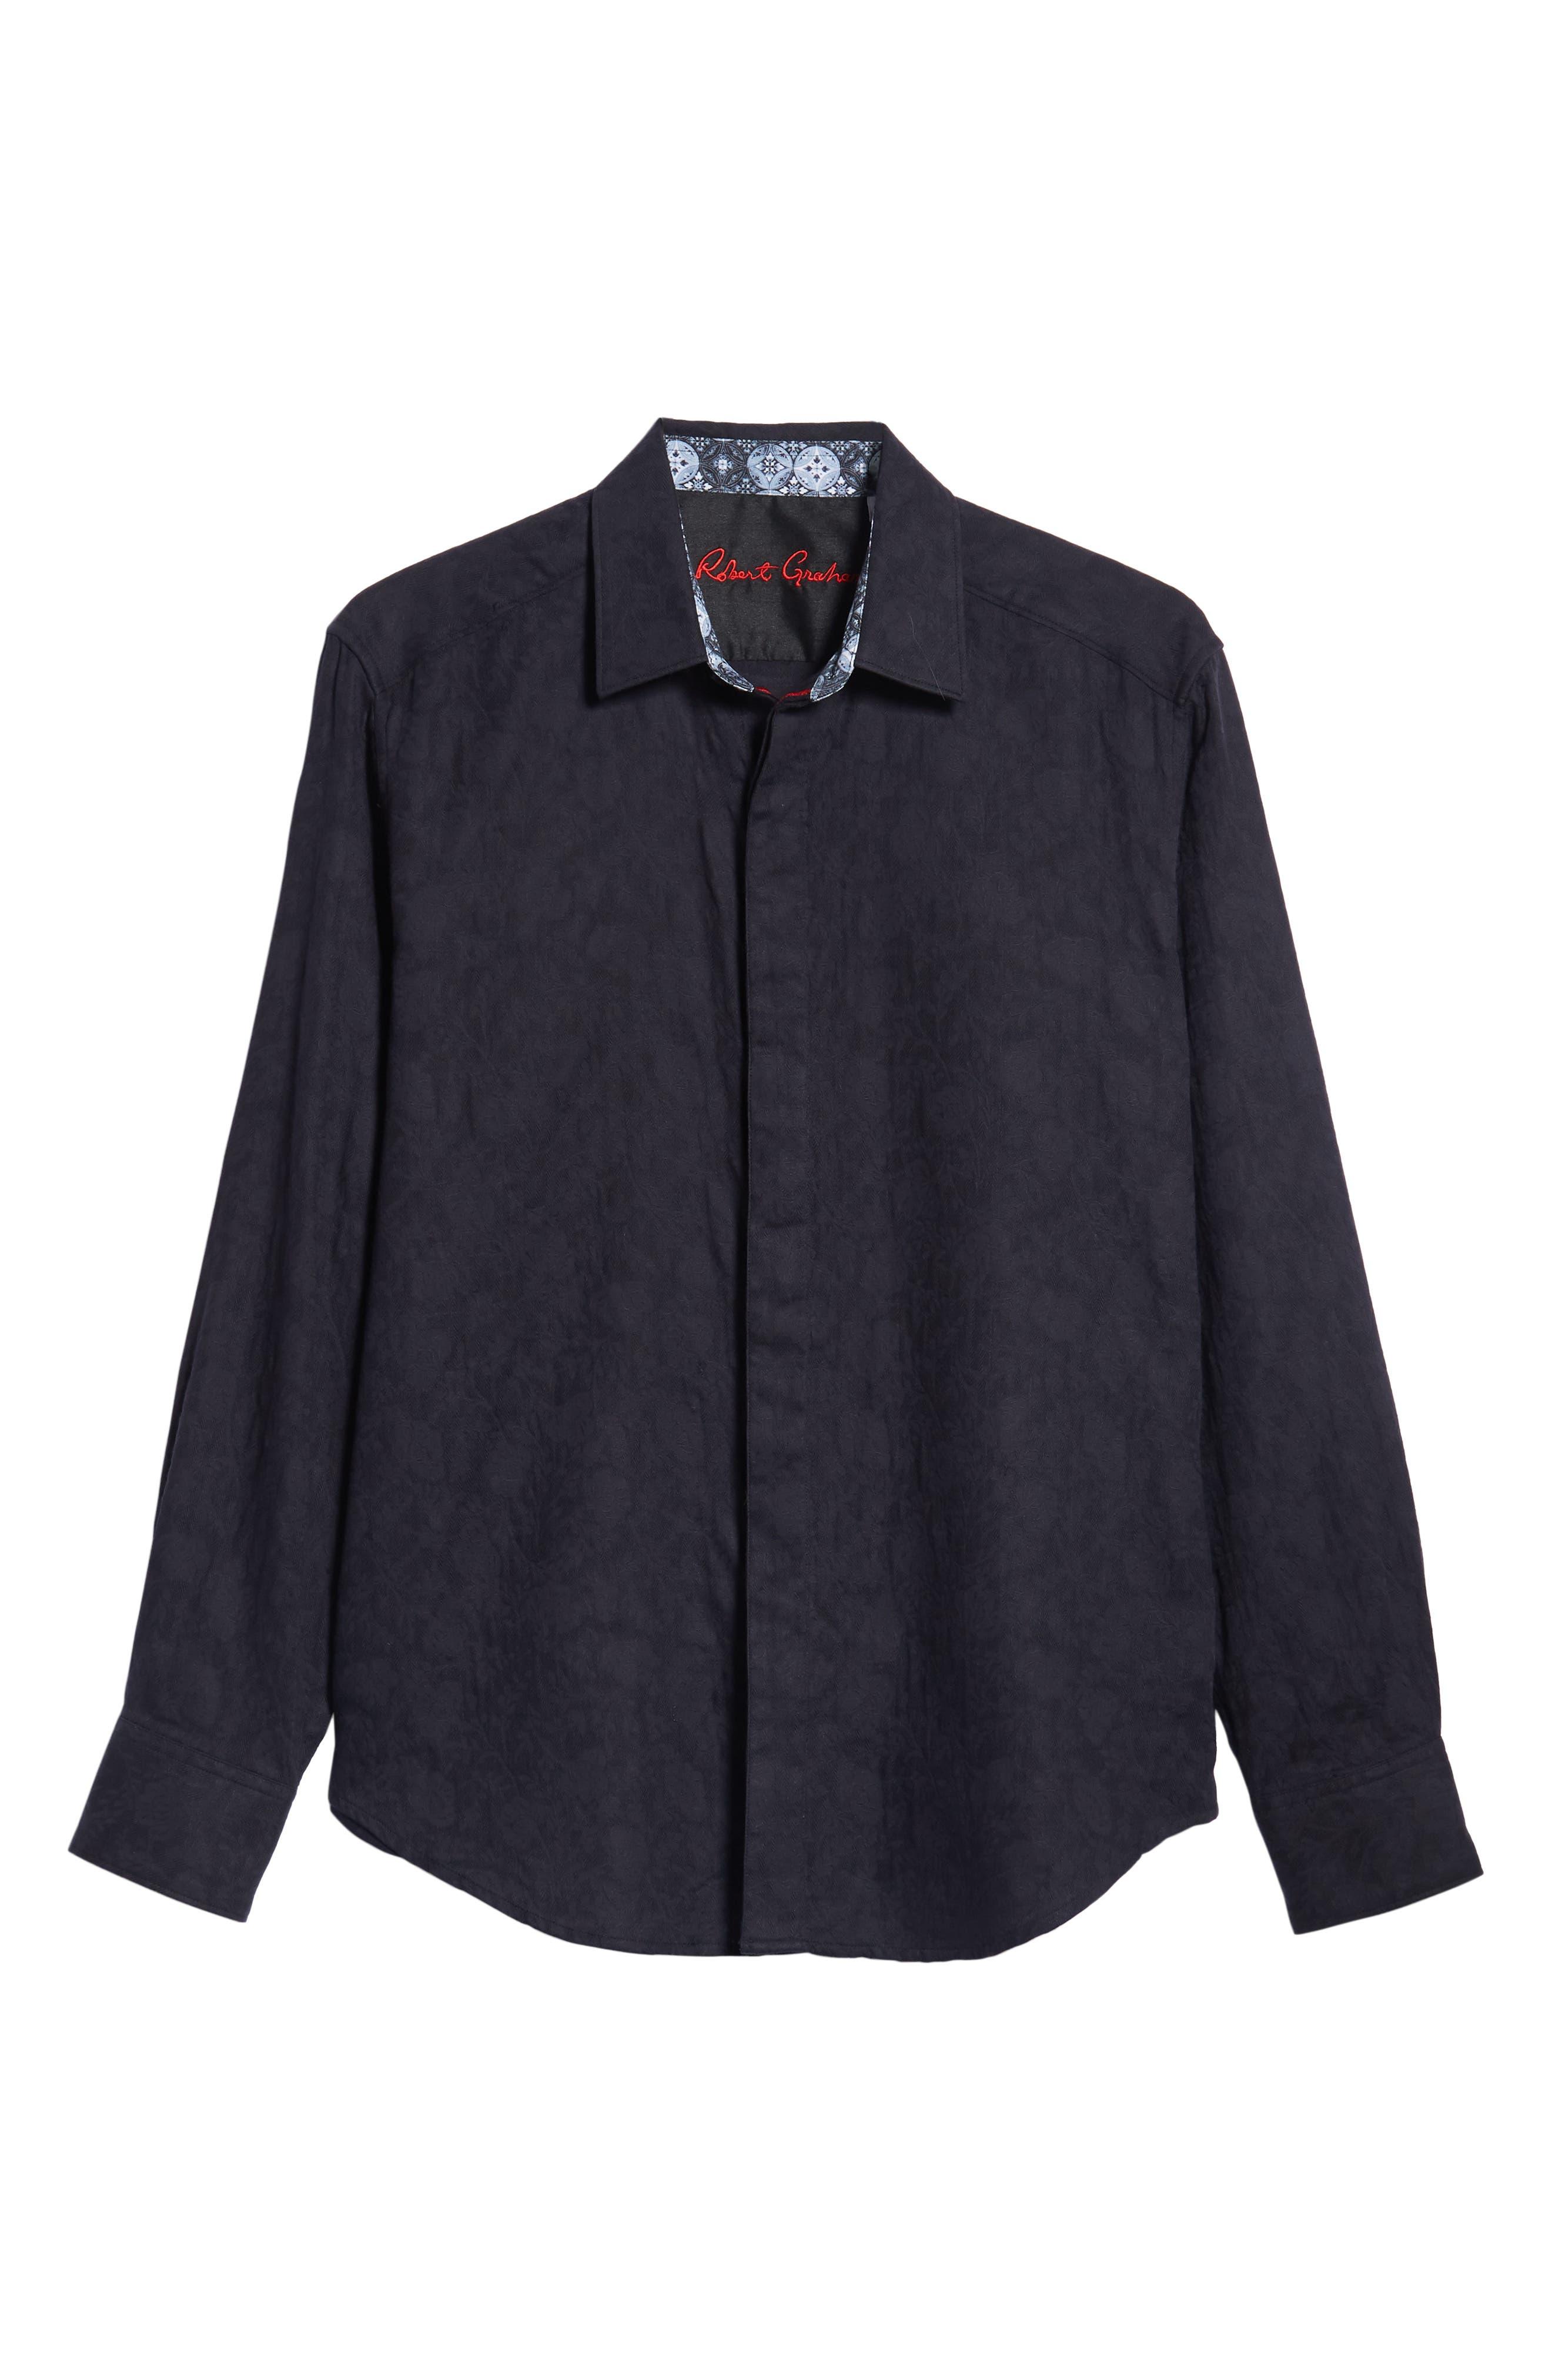 Nicholls Classic Fit Sport Shirt,                             Alternate thumbnail 5, color,                             BLACK